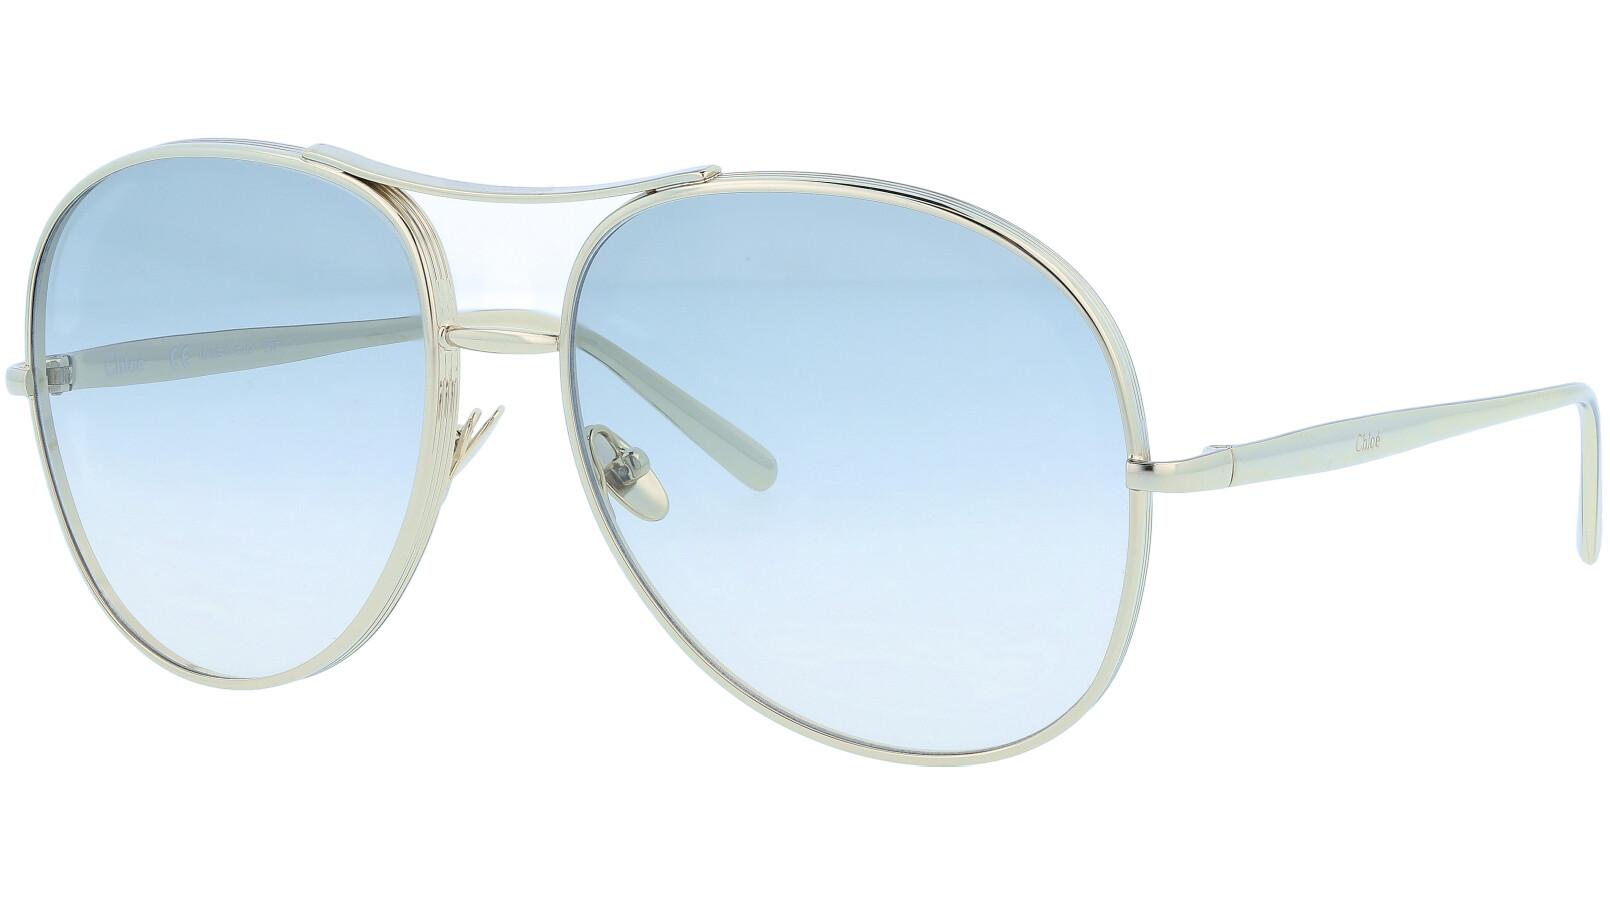 CHLOE CE127S 768 61 GOLD Sunglasses